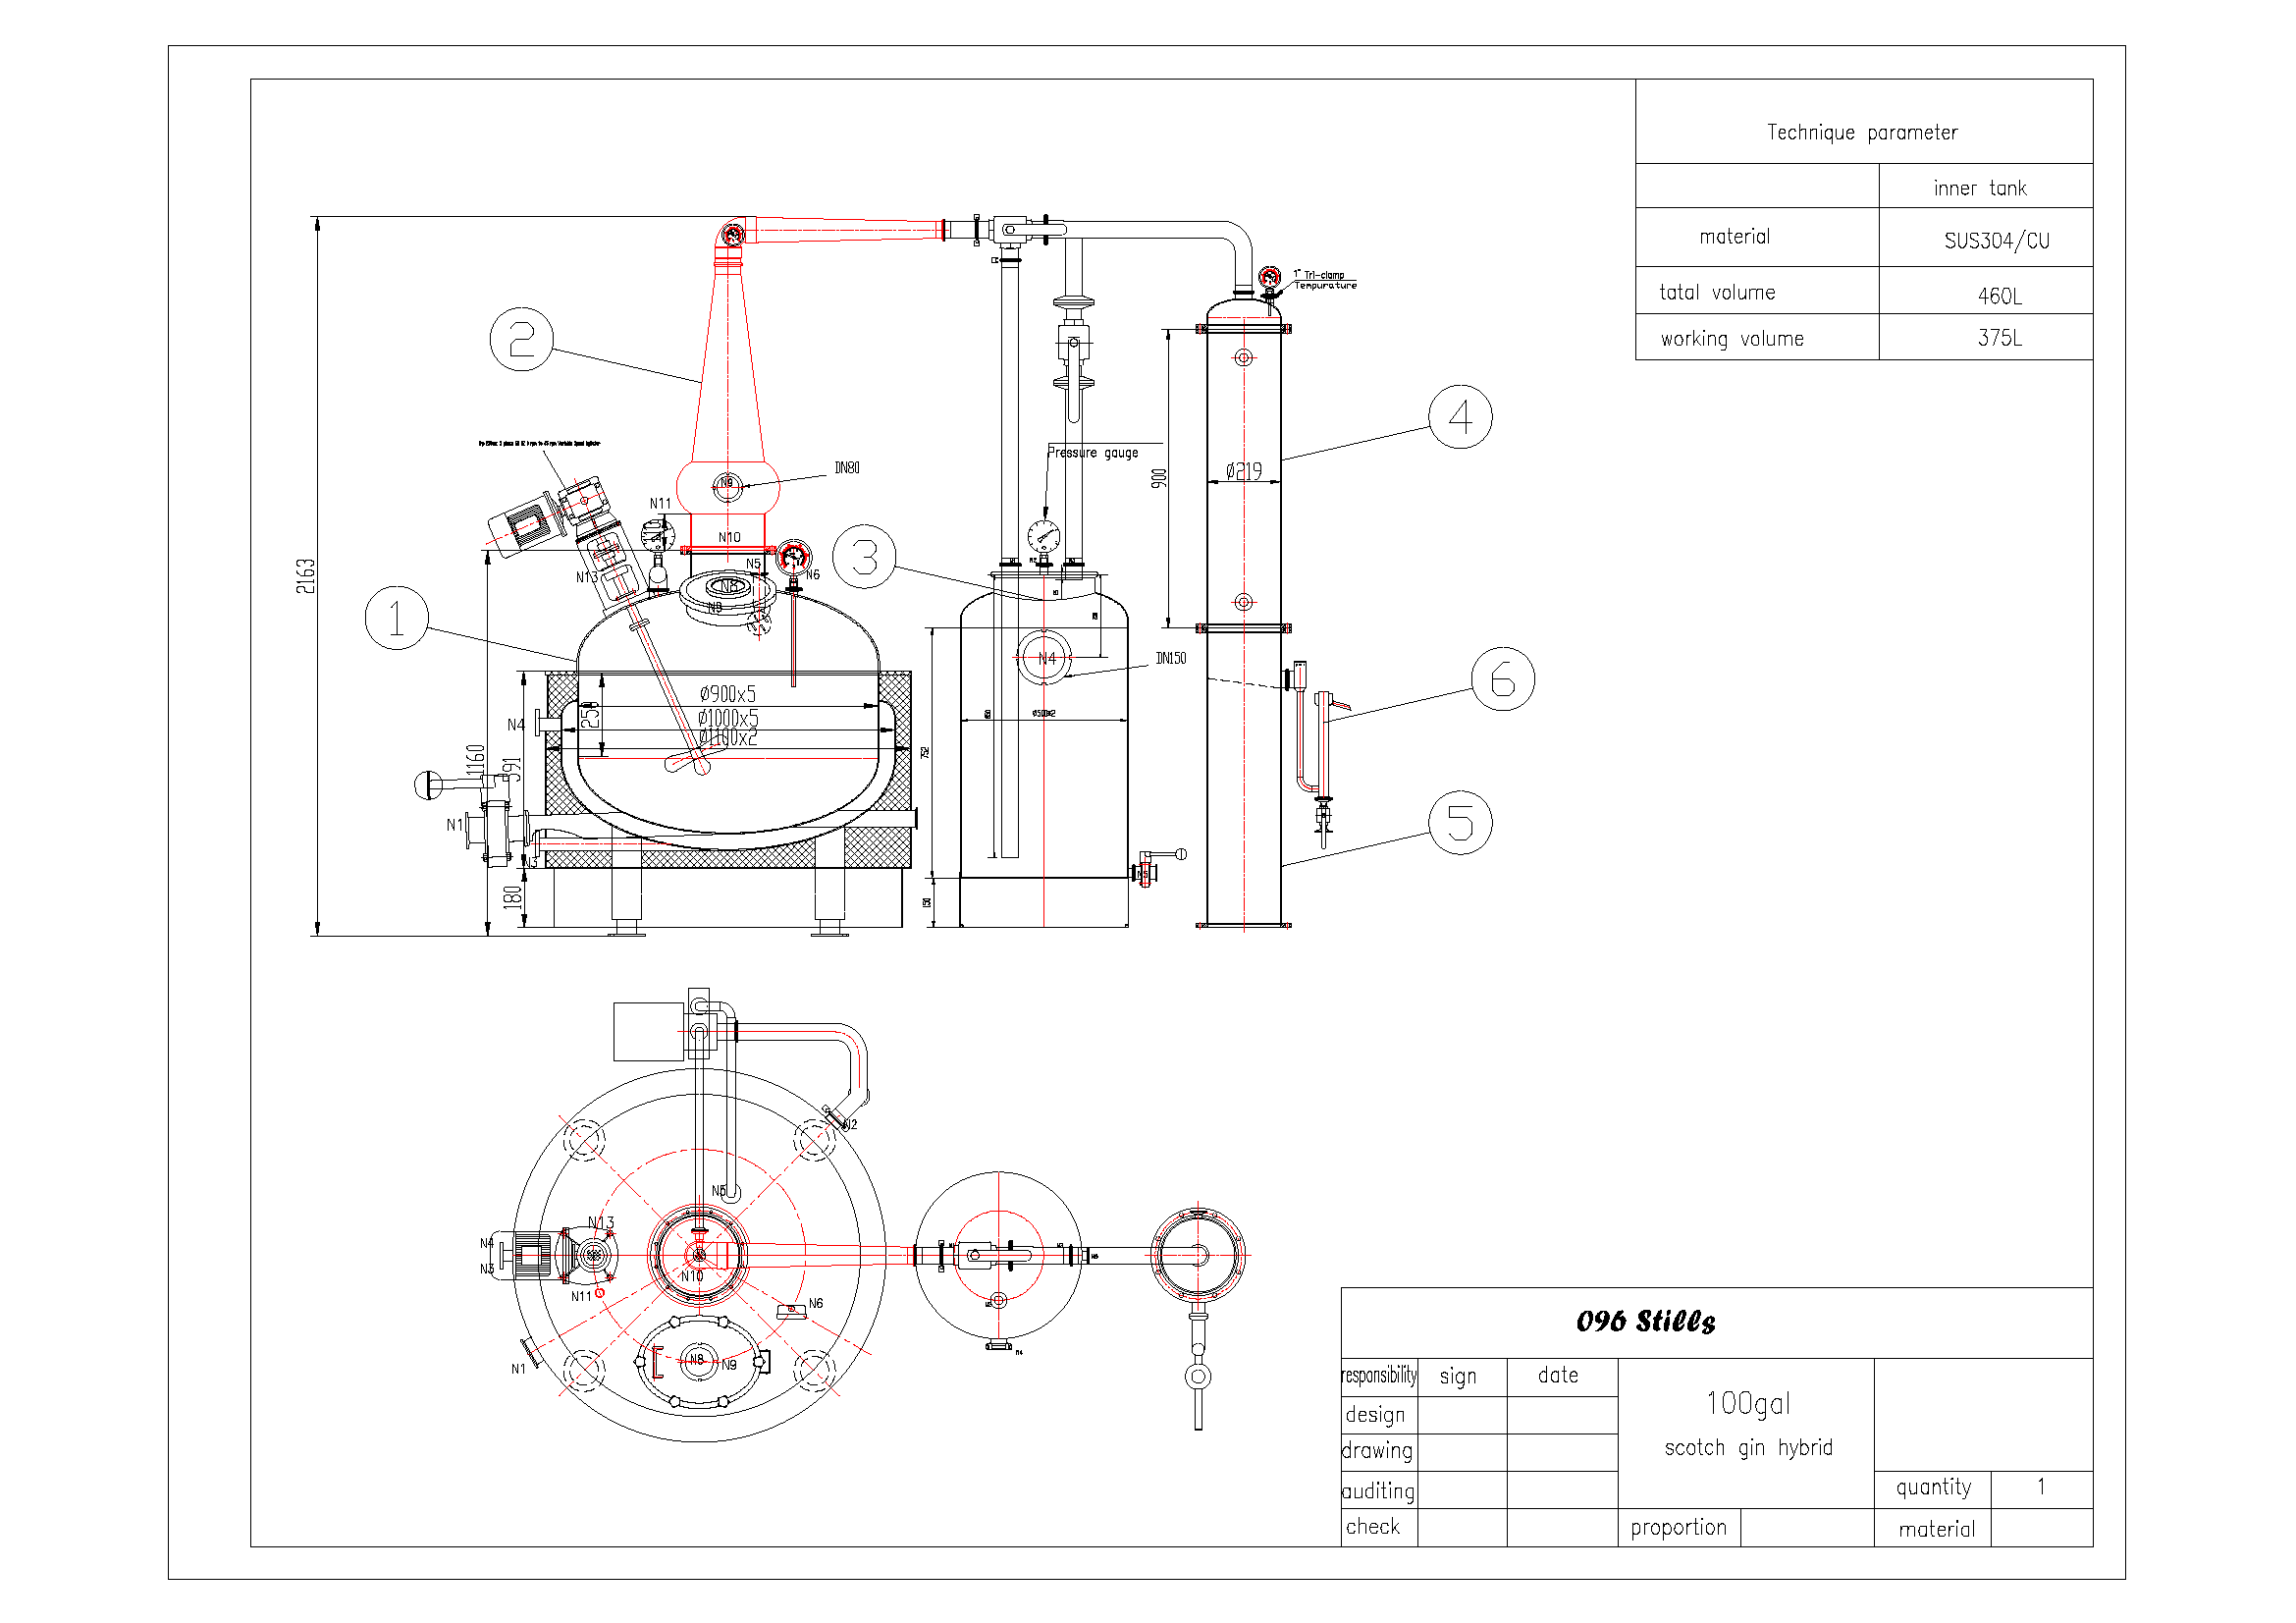 096 Stills Reflux Still Diagram Pro Line Mash Tun Boilers